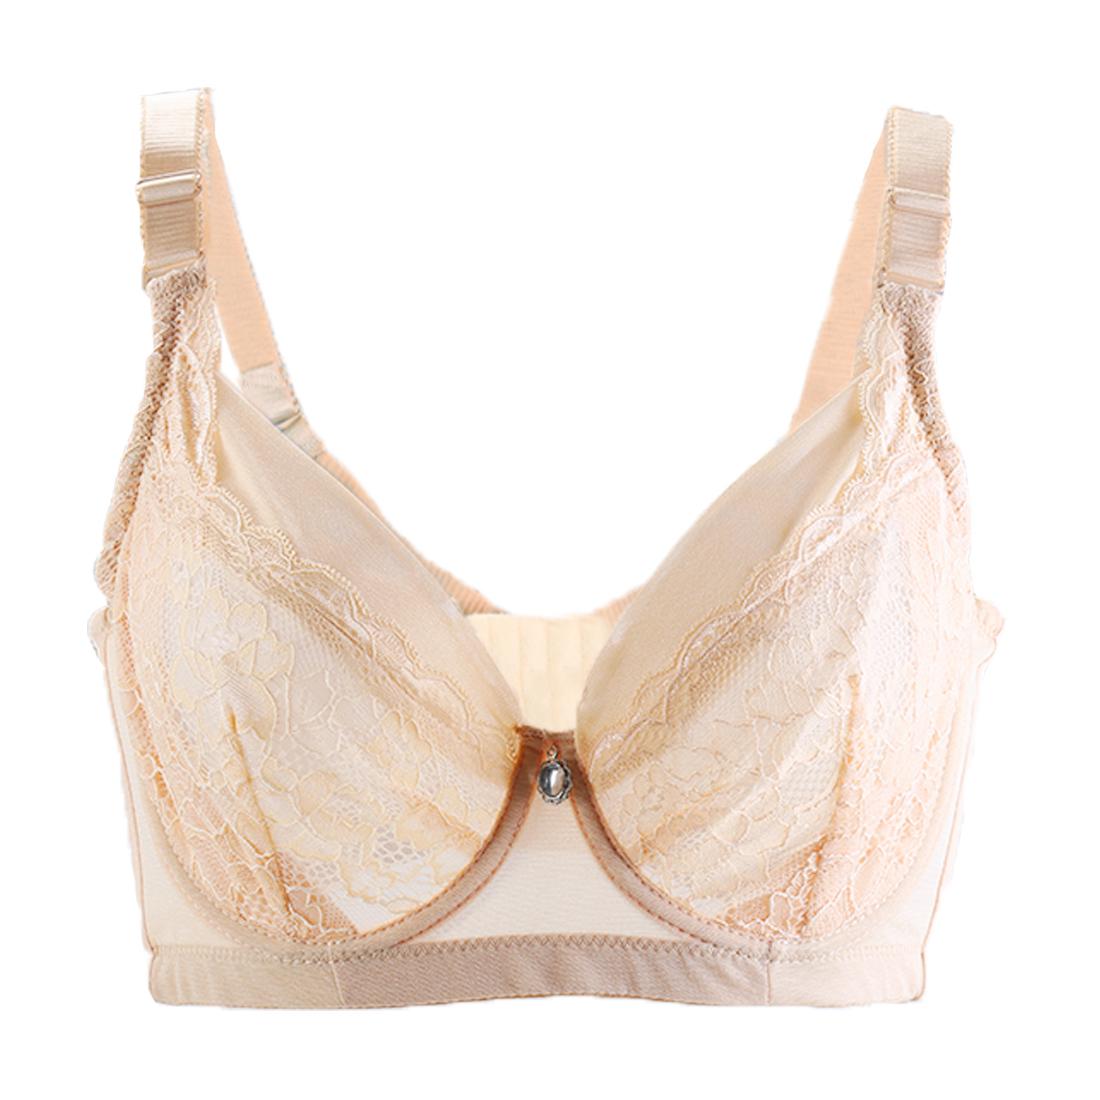 Women Semitransparent Push Up Lace Deco Thin Cup Underwire Bra Beige 34/75